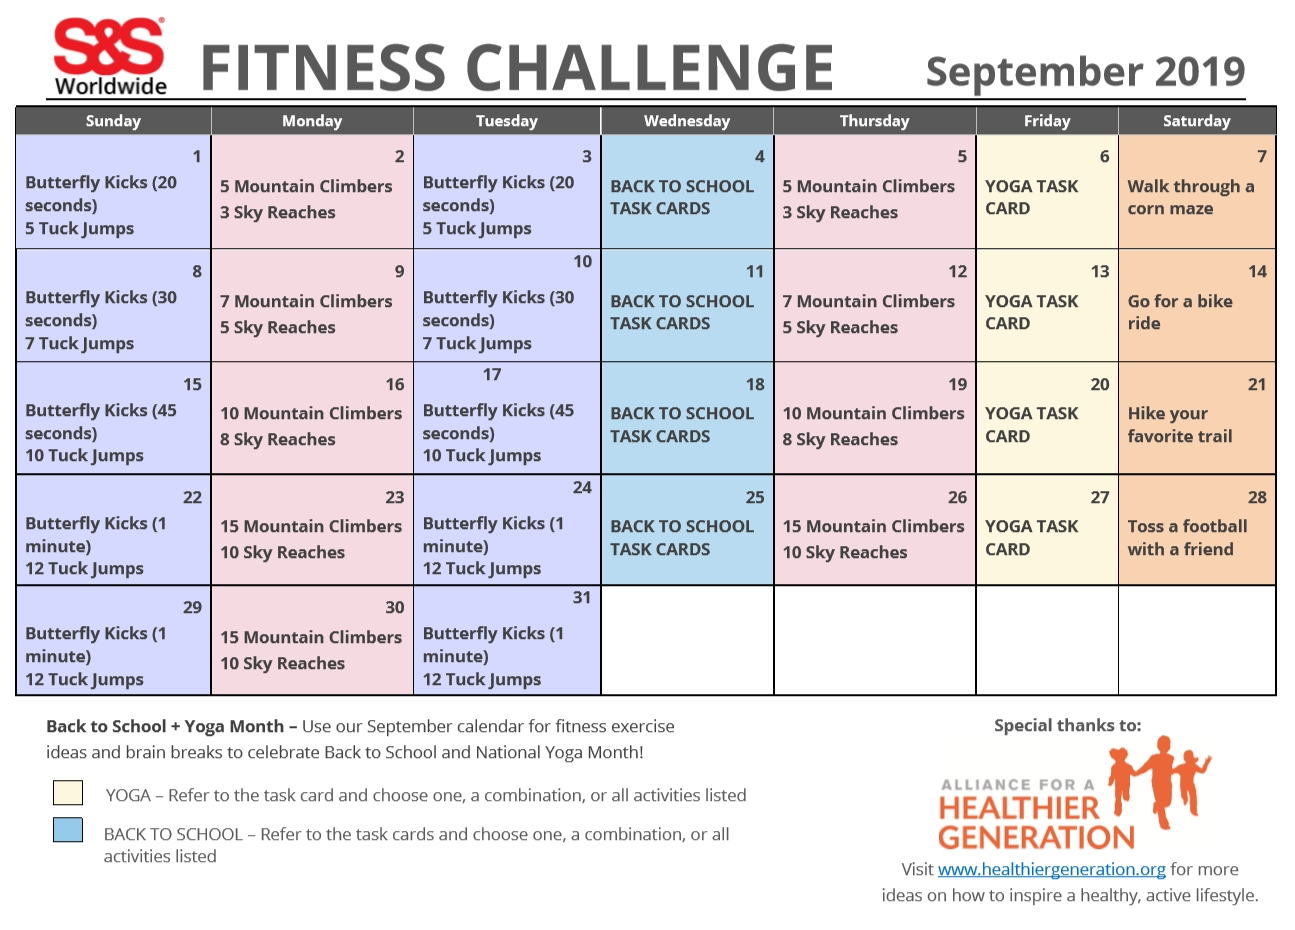 September Printable Fitness Challenge Calendar - S&s Blog  Exercise Challenge Printable